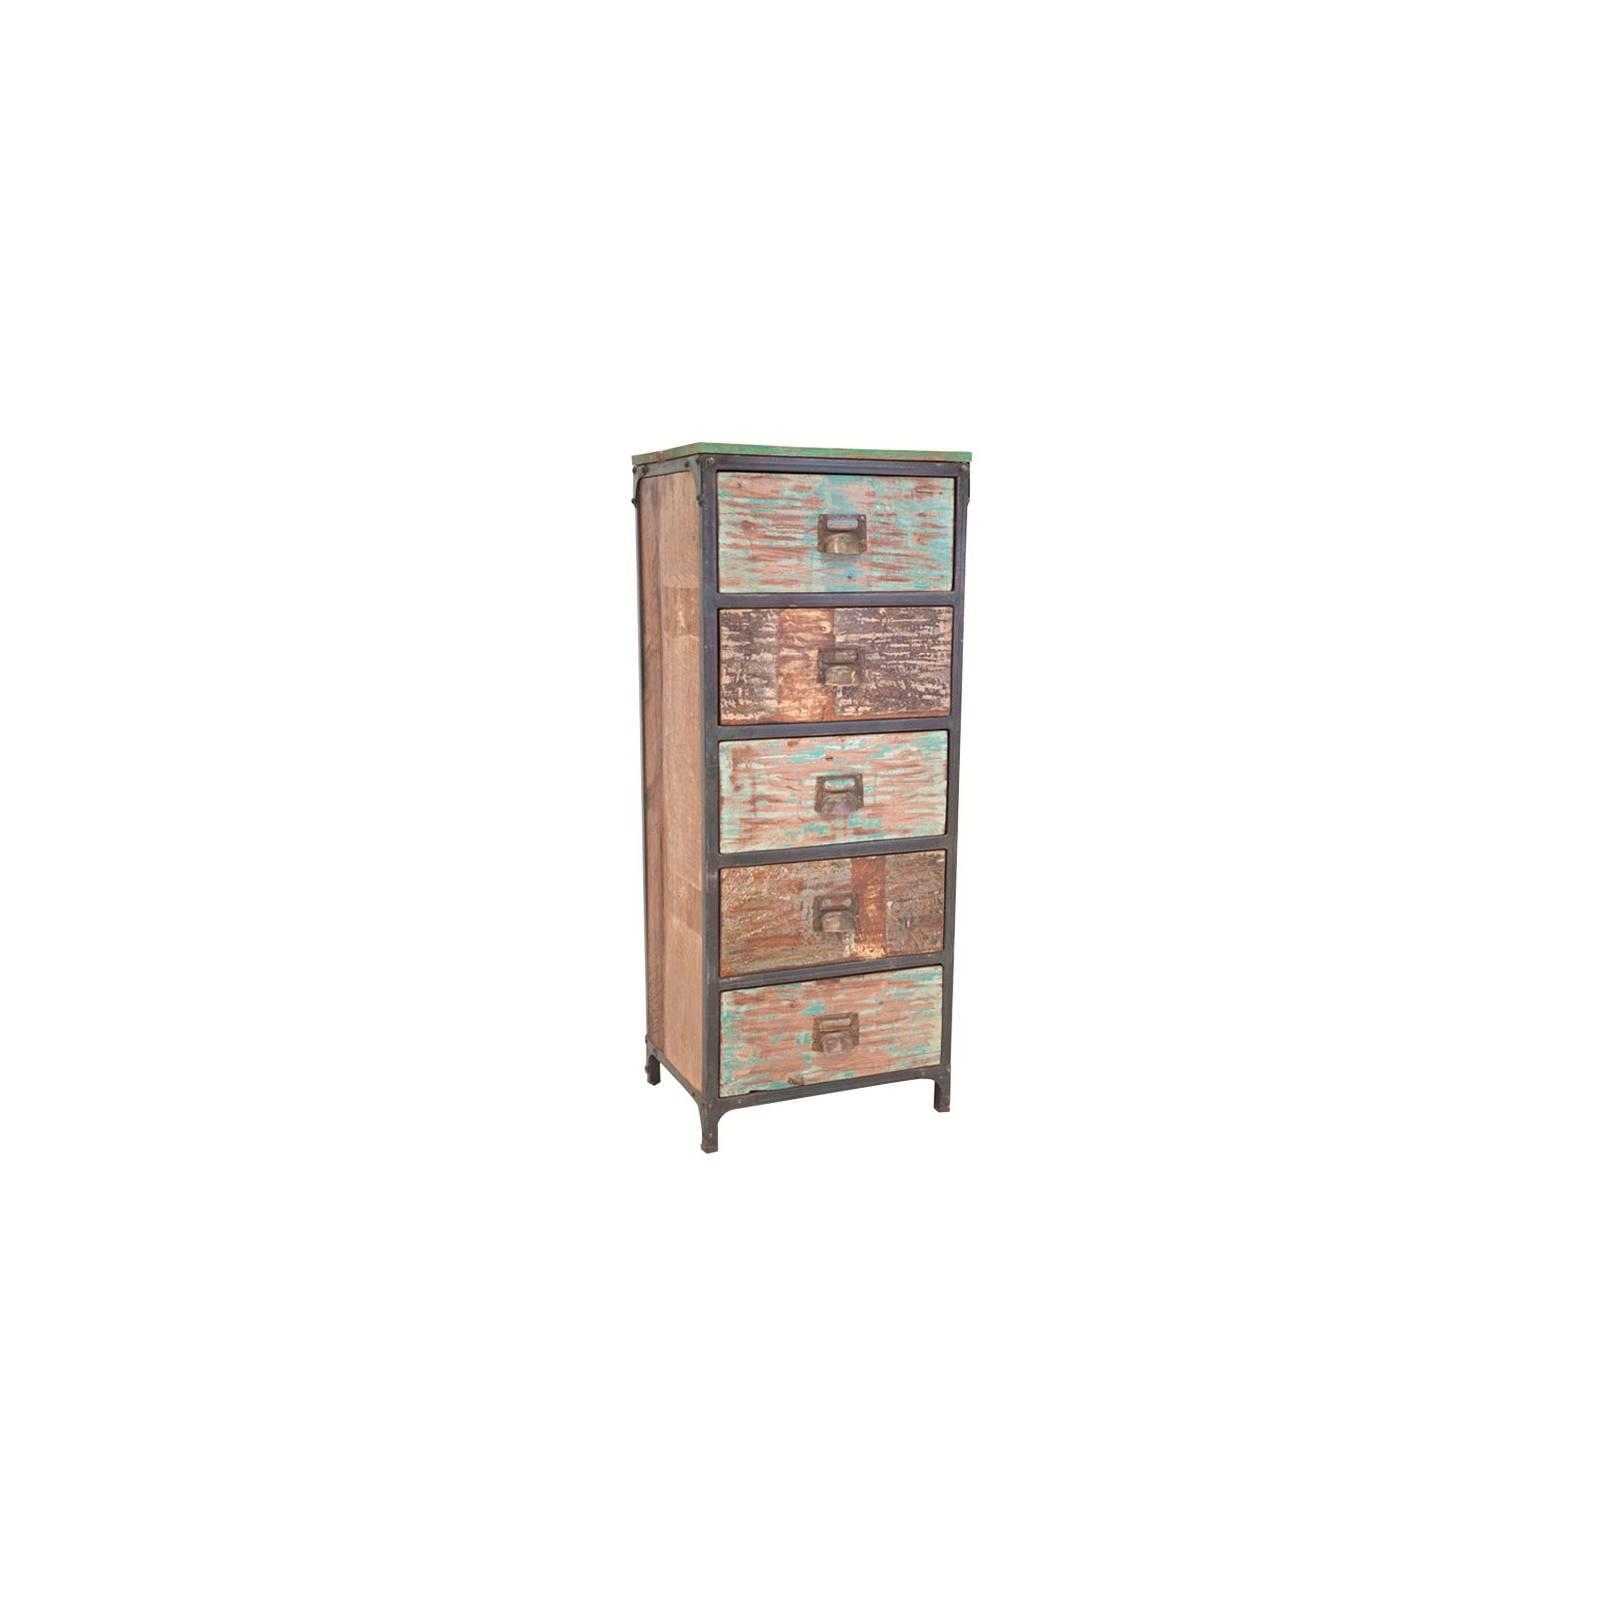 Chiffonnier GM Butterfly Palissandre - meuble industriel en bois exotique